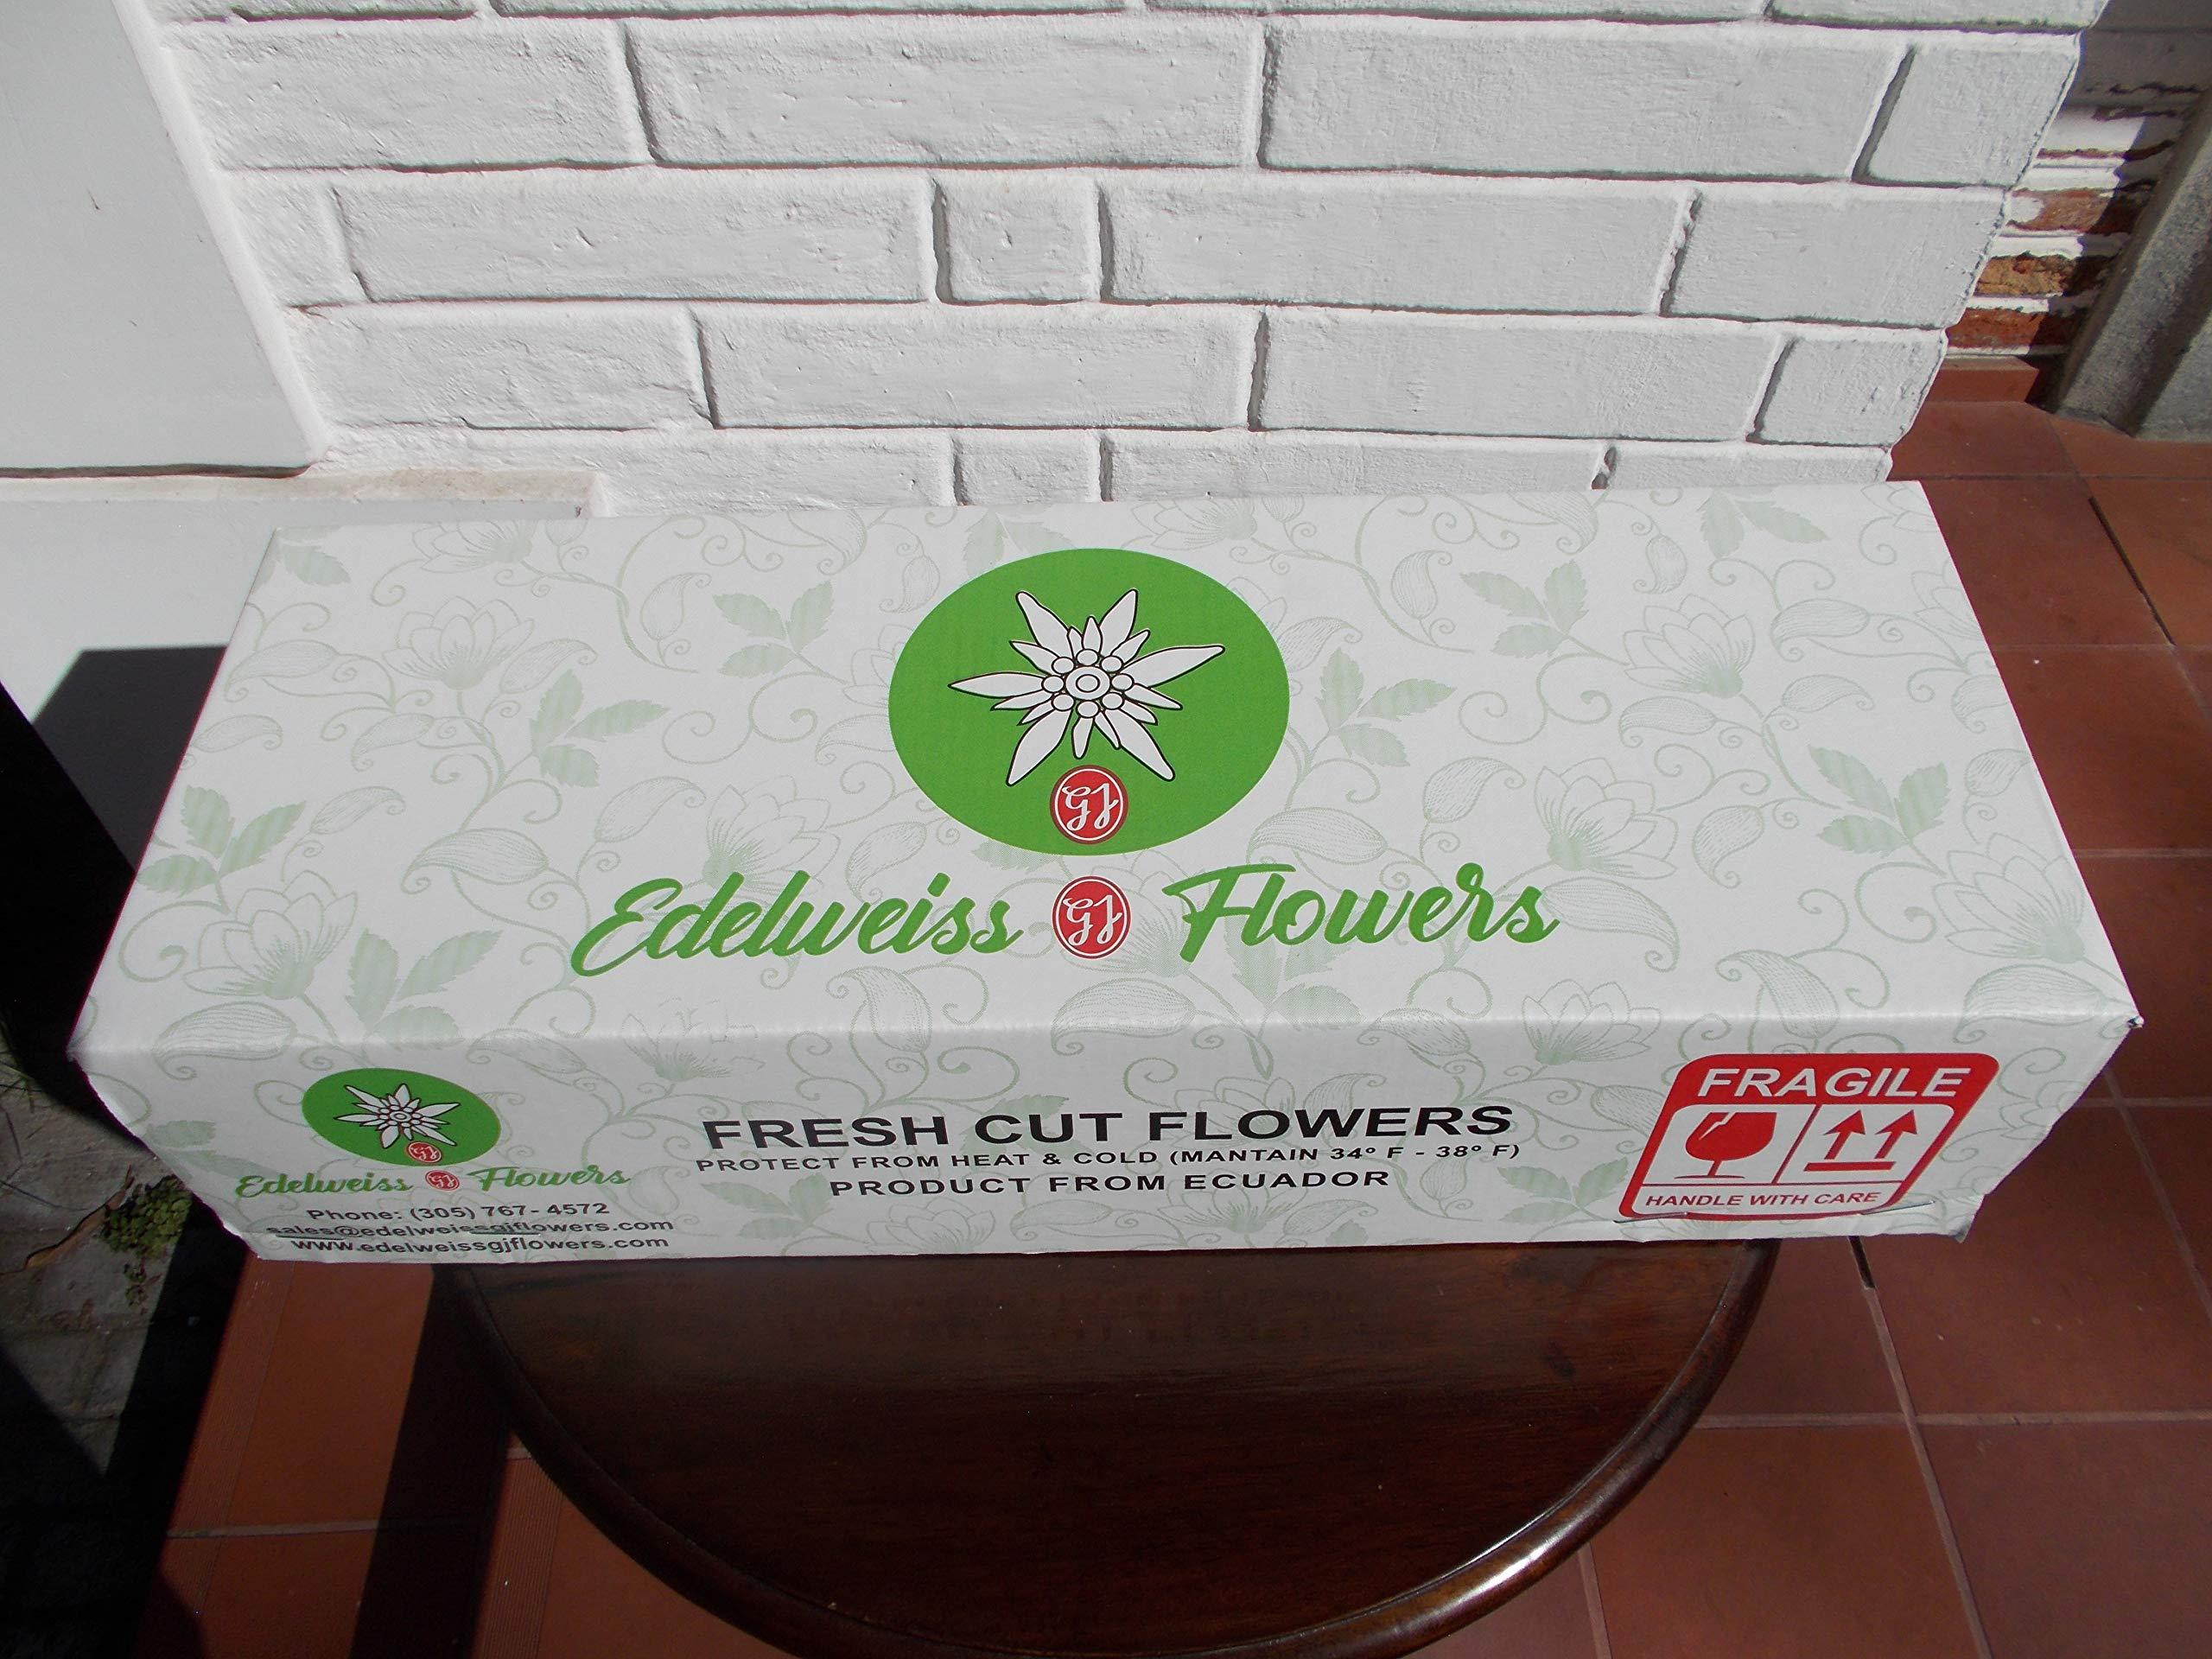 Edelweiss GJ Flowers Super Star